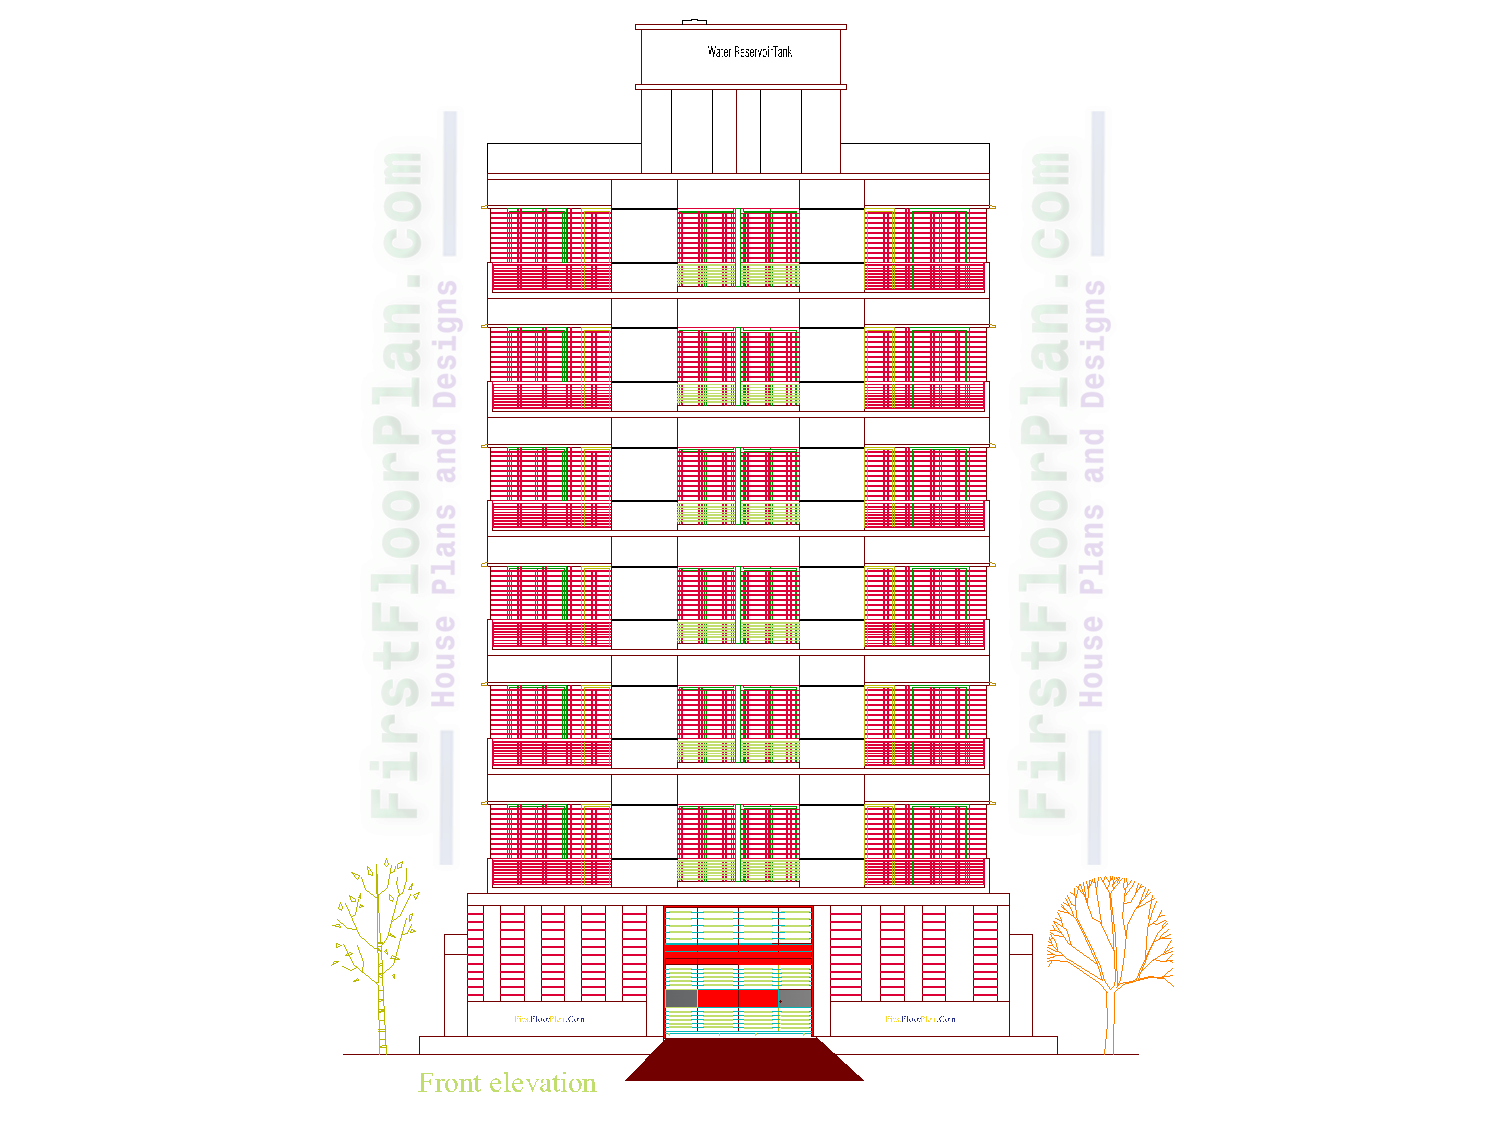 7 Storey Apartment Building Elevation